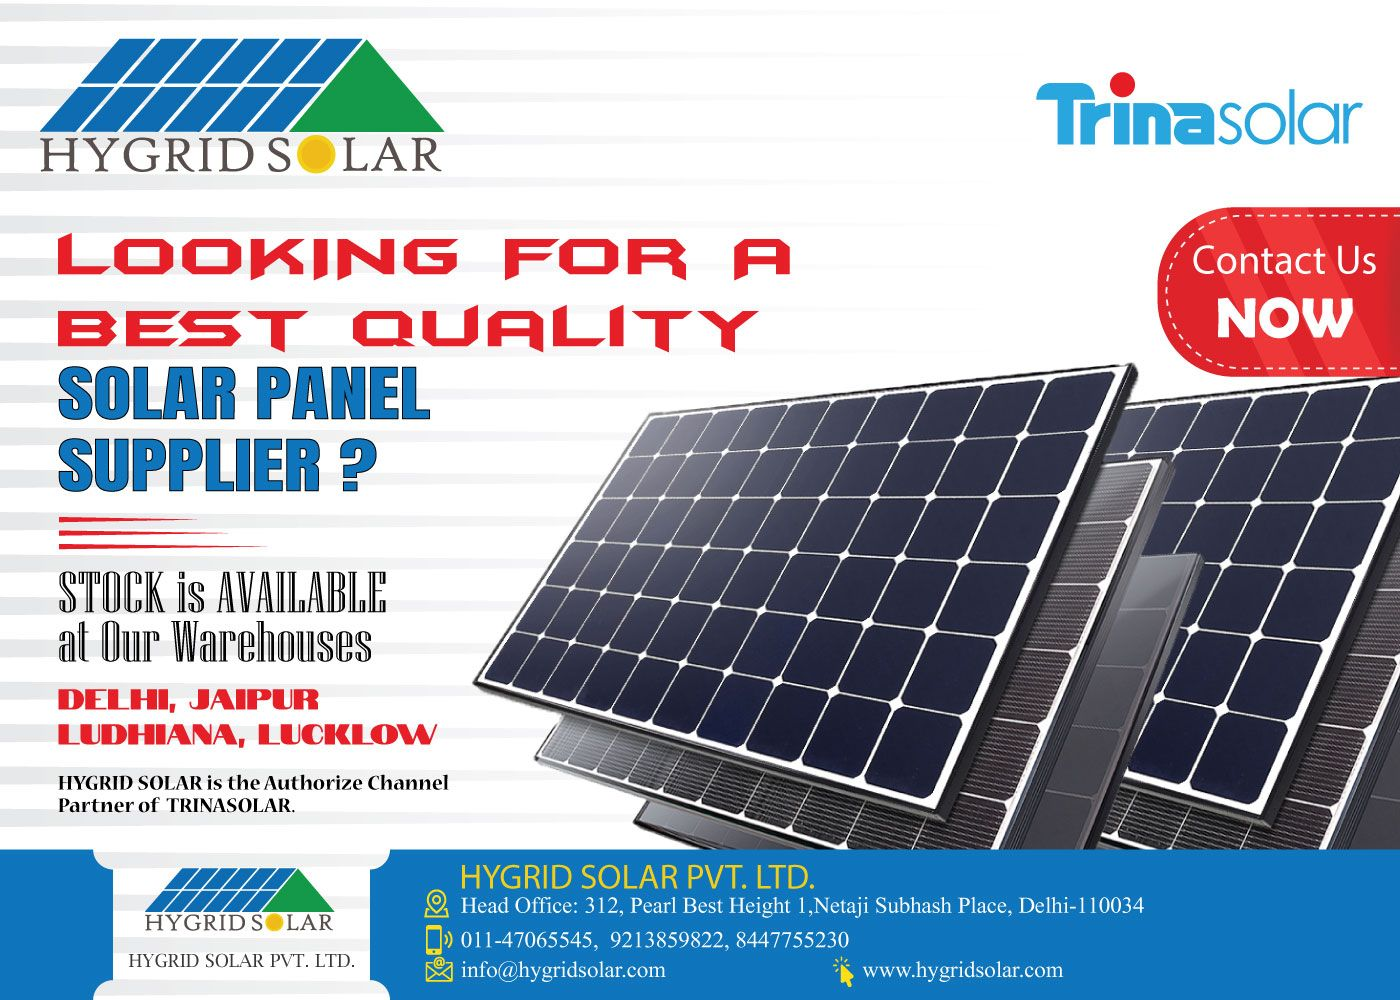 Hygridsolar Pvt Ltd Solarproduct Solarproducts Solarpanels Bestsolarpanel Bestsolarpanels Solarpanel Spvmodule Sp Solar Panels Solar Solar Solutions